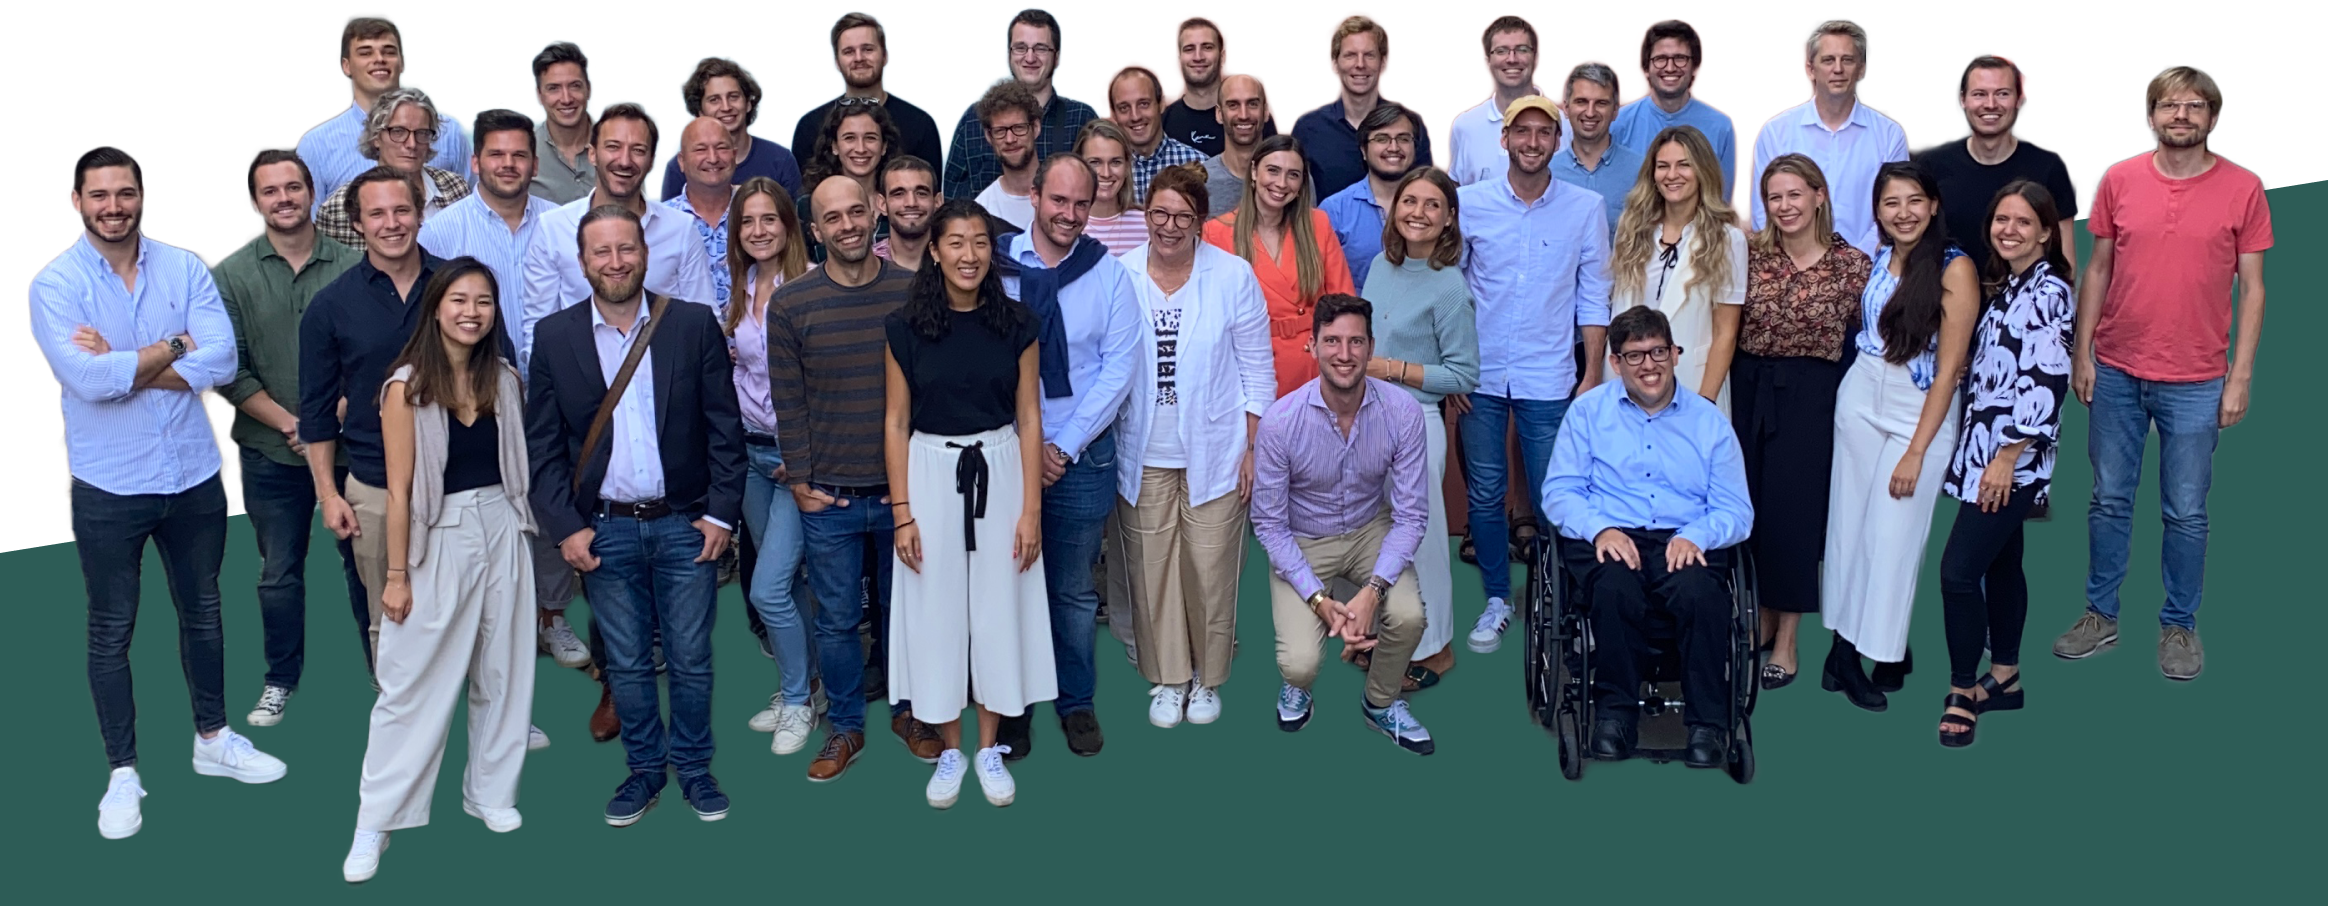 A group image of Yokoy team members